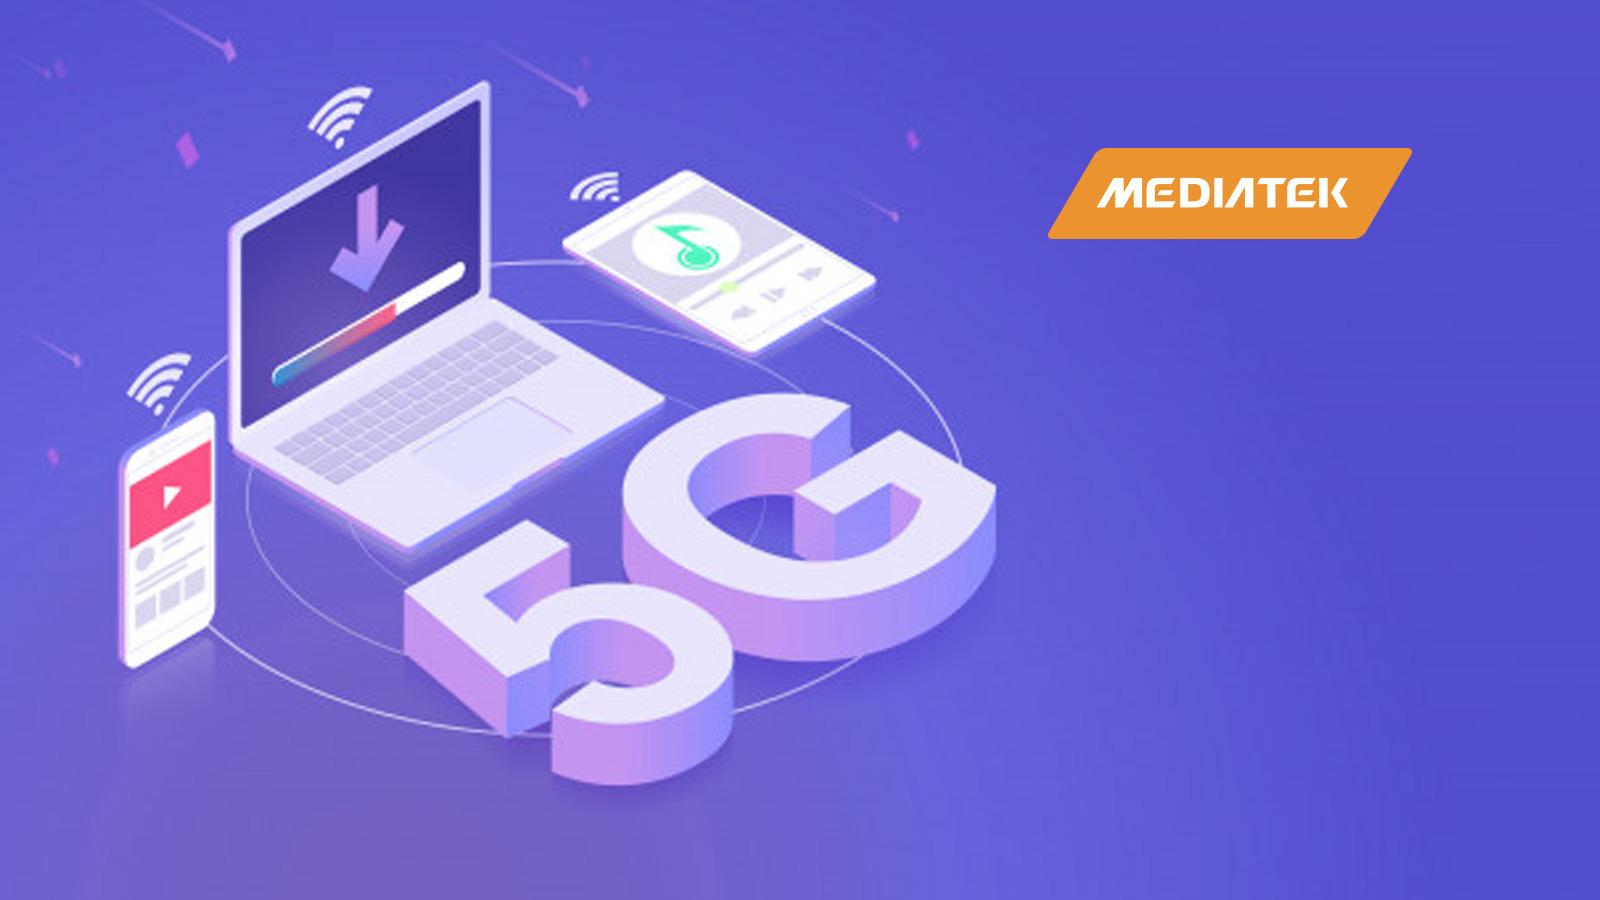 Helio M70 5G modem Devices